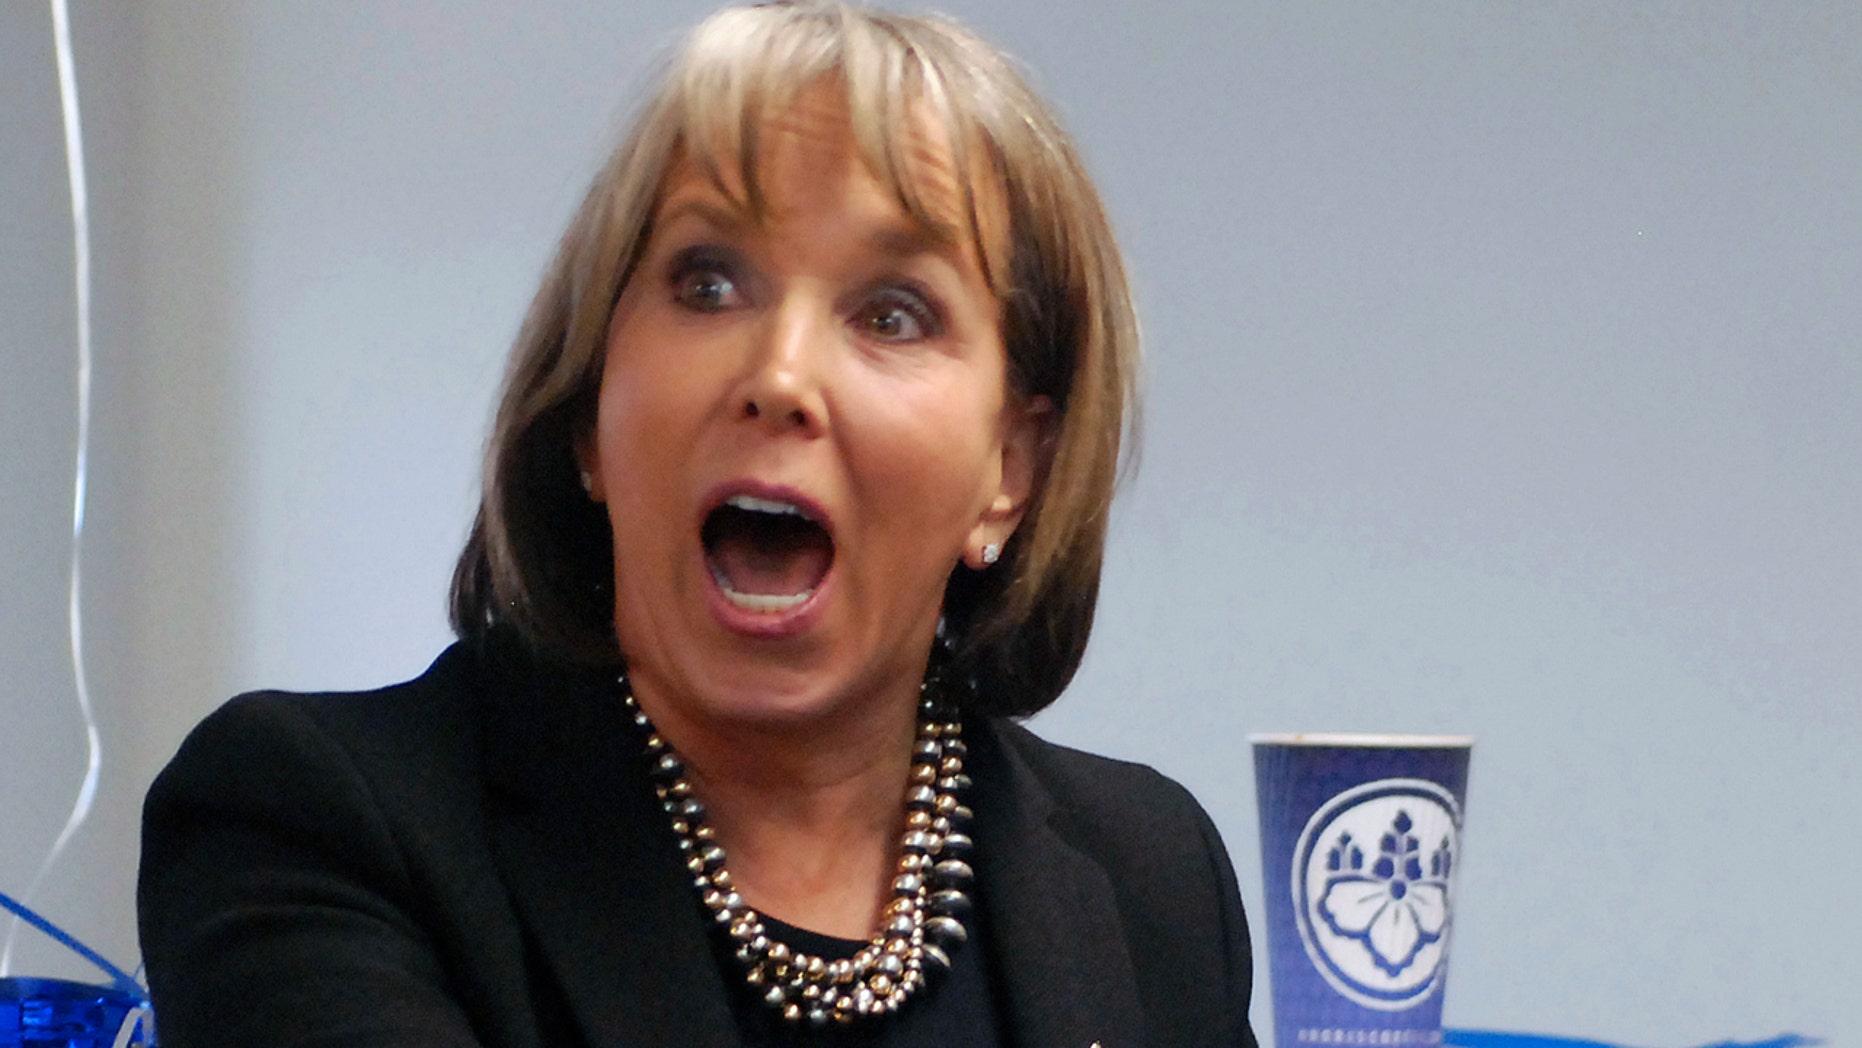 U.S. Rep. Michelle Lujan Grisham will face Republican U.S. Rep. Steve Pearce in November's general election.